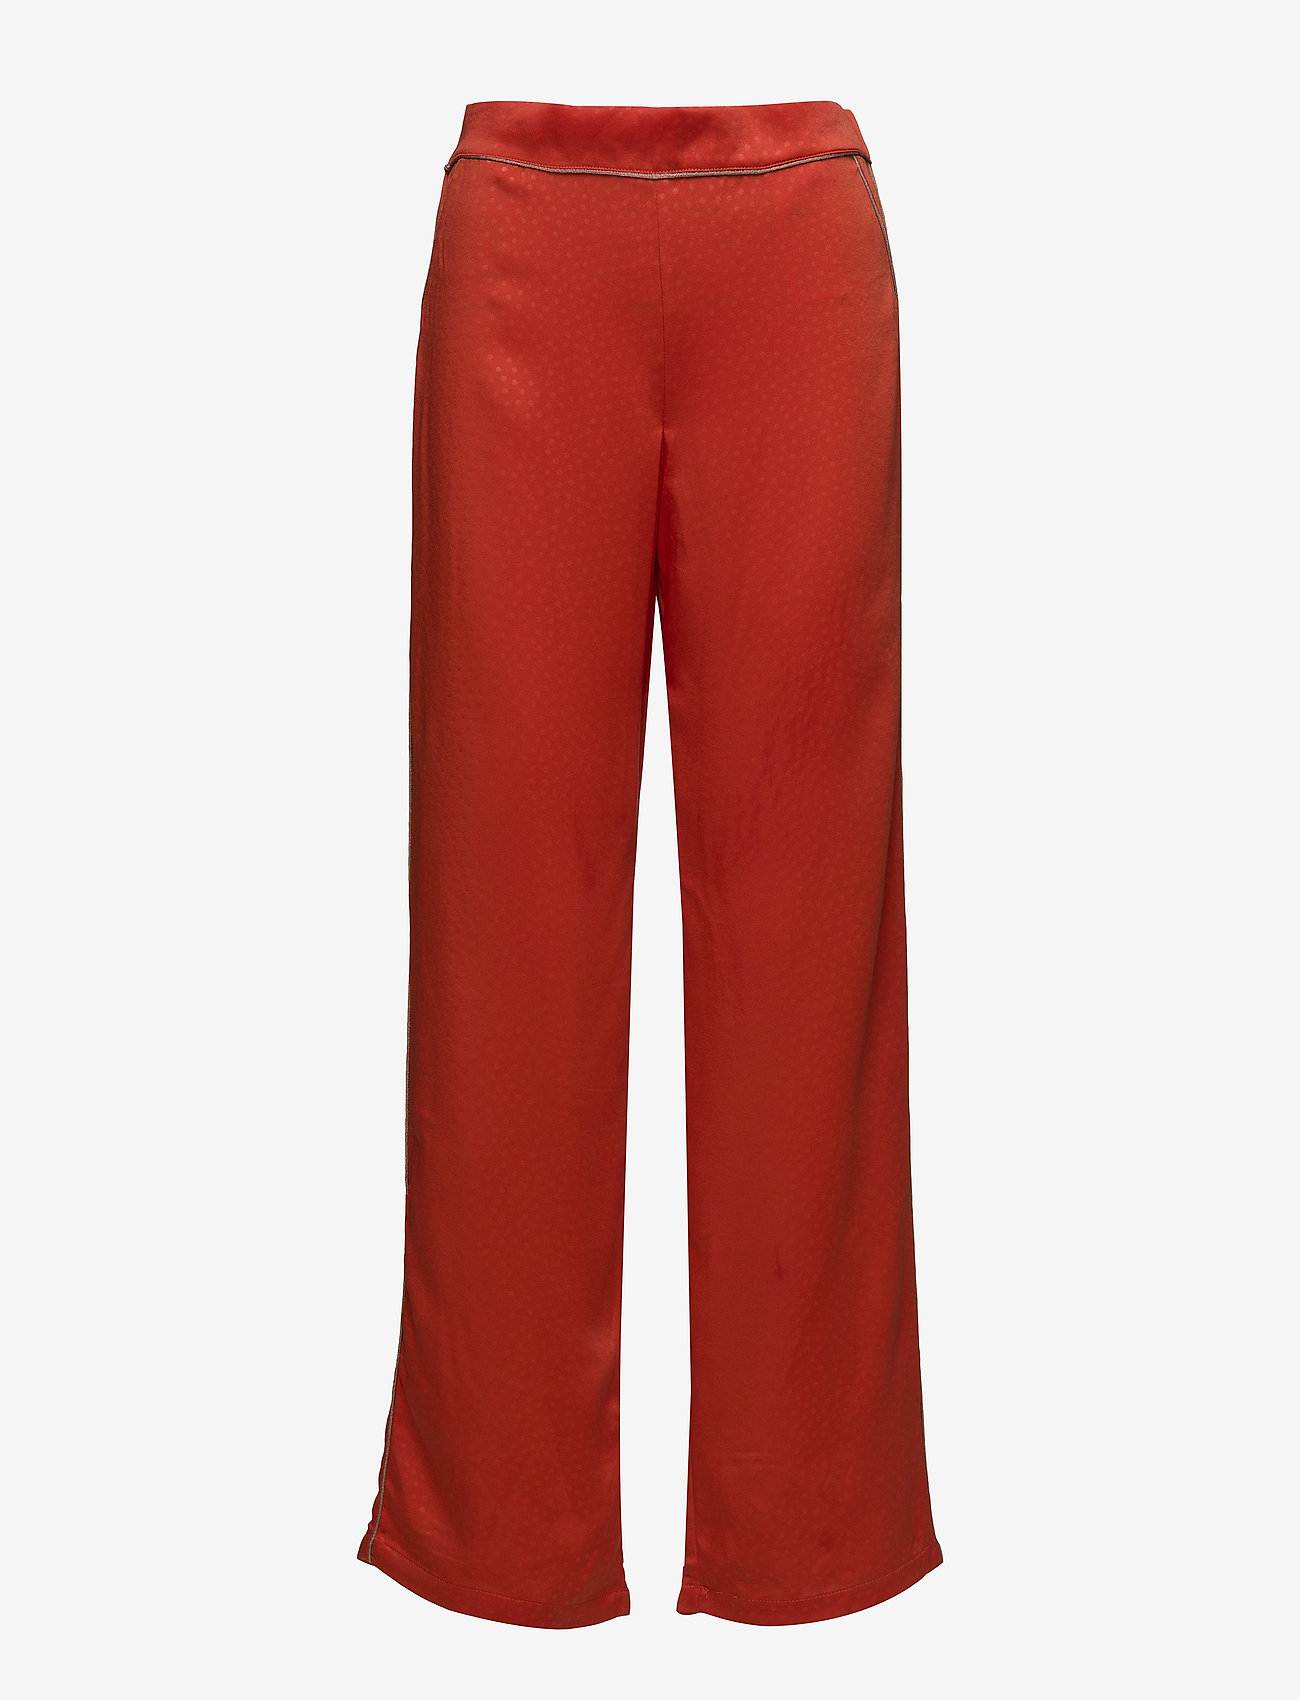 Vila - VIJUANA PANTS - wide leg trousers - orange.com - 0